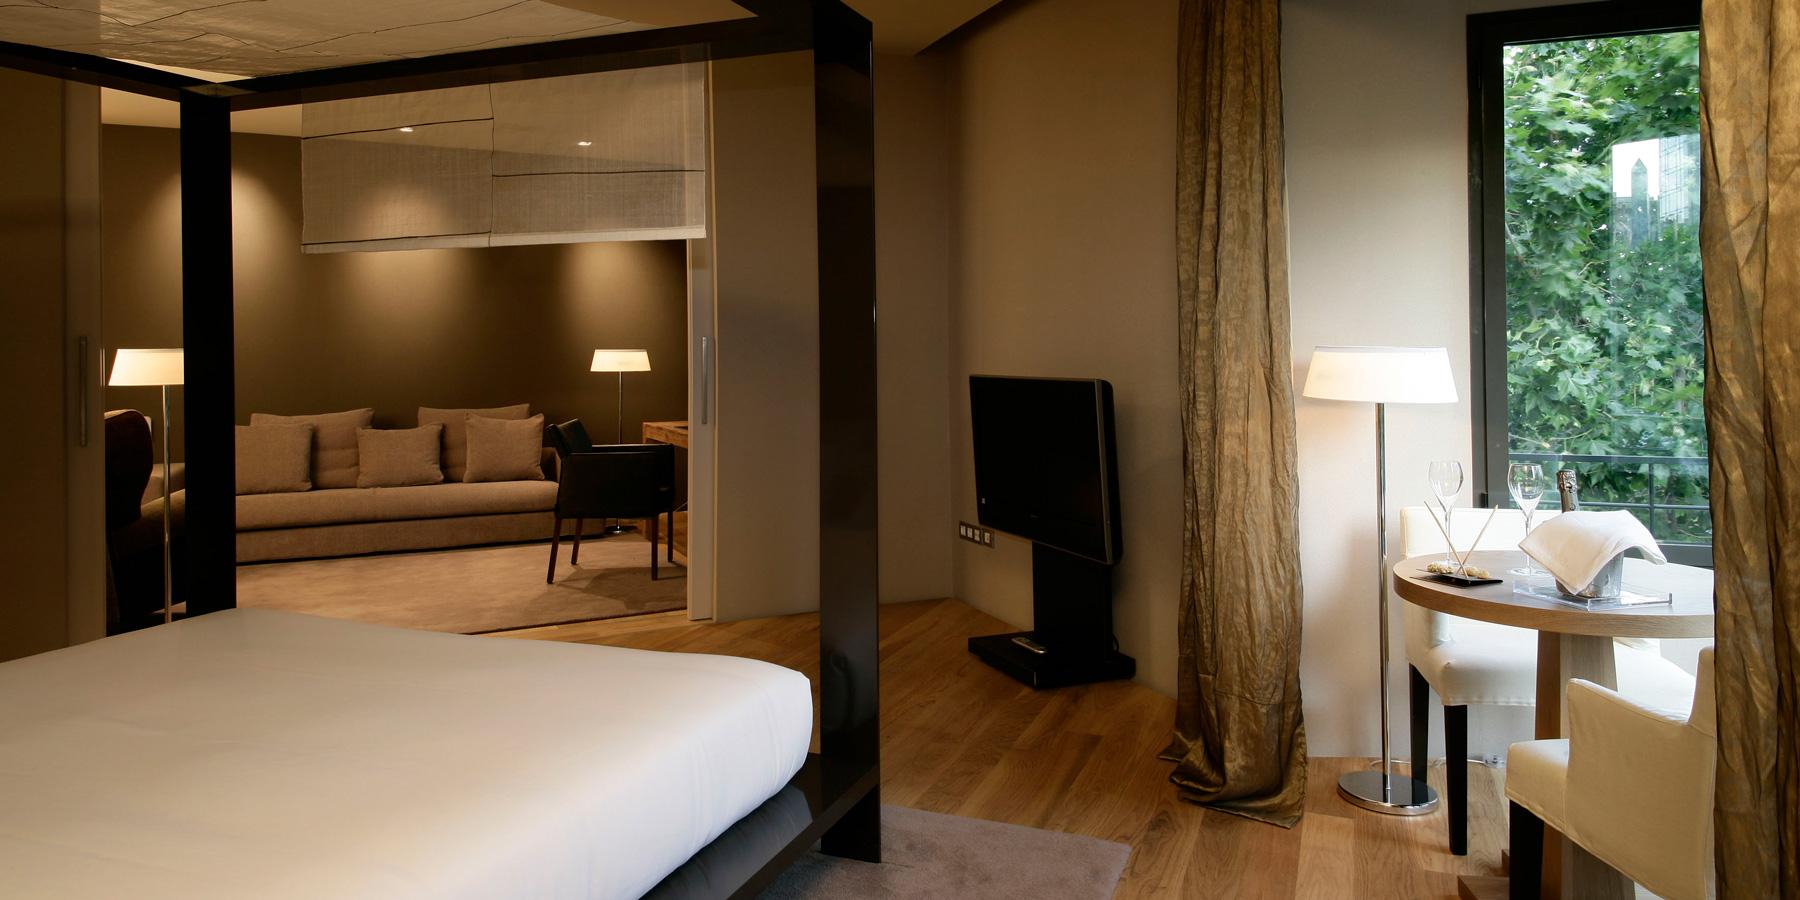 Hotel omm barcelona spain revpar marketing for Design hotel valencia spain